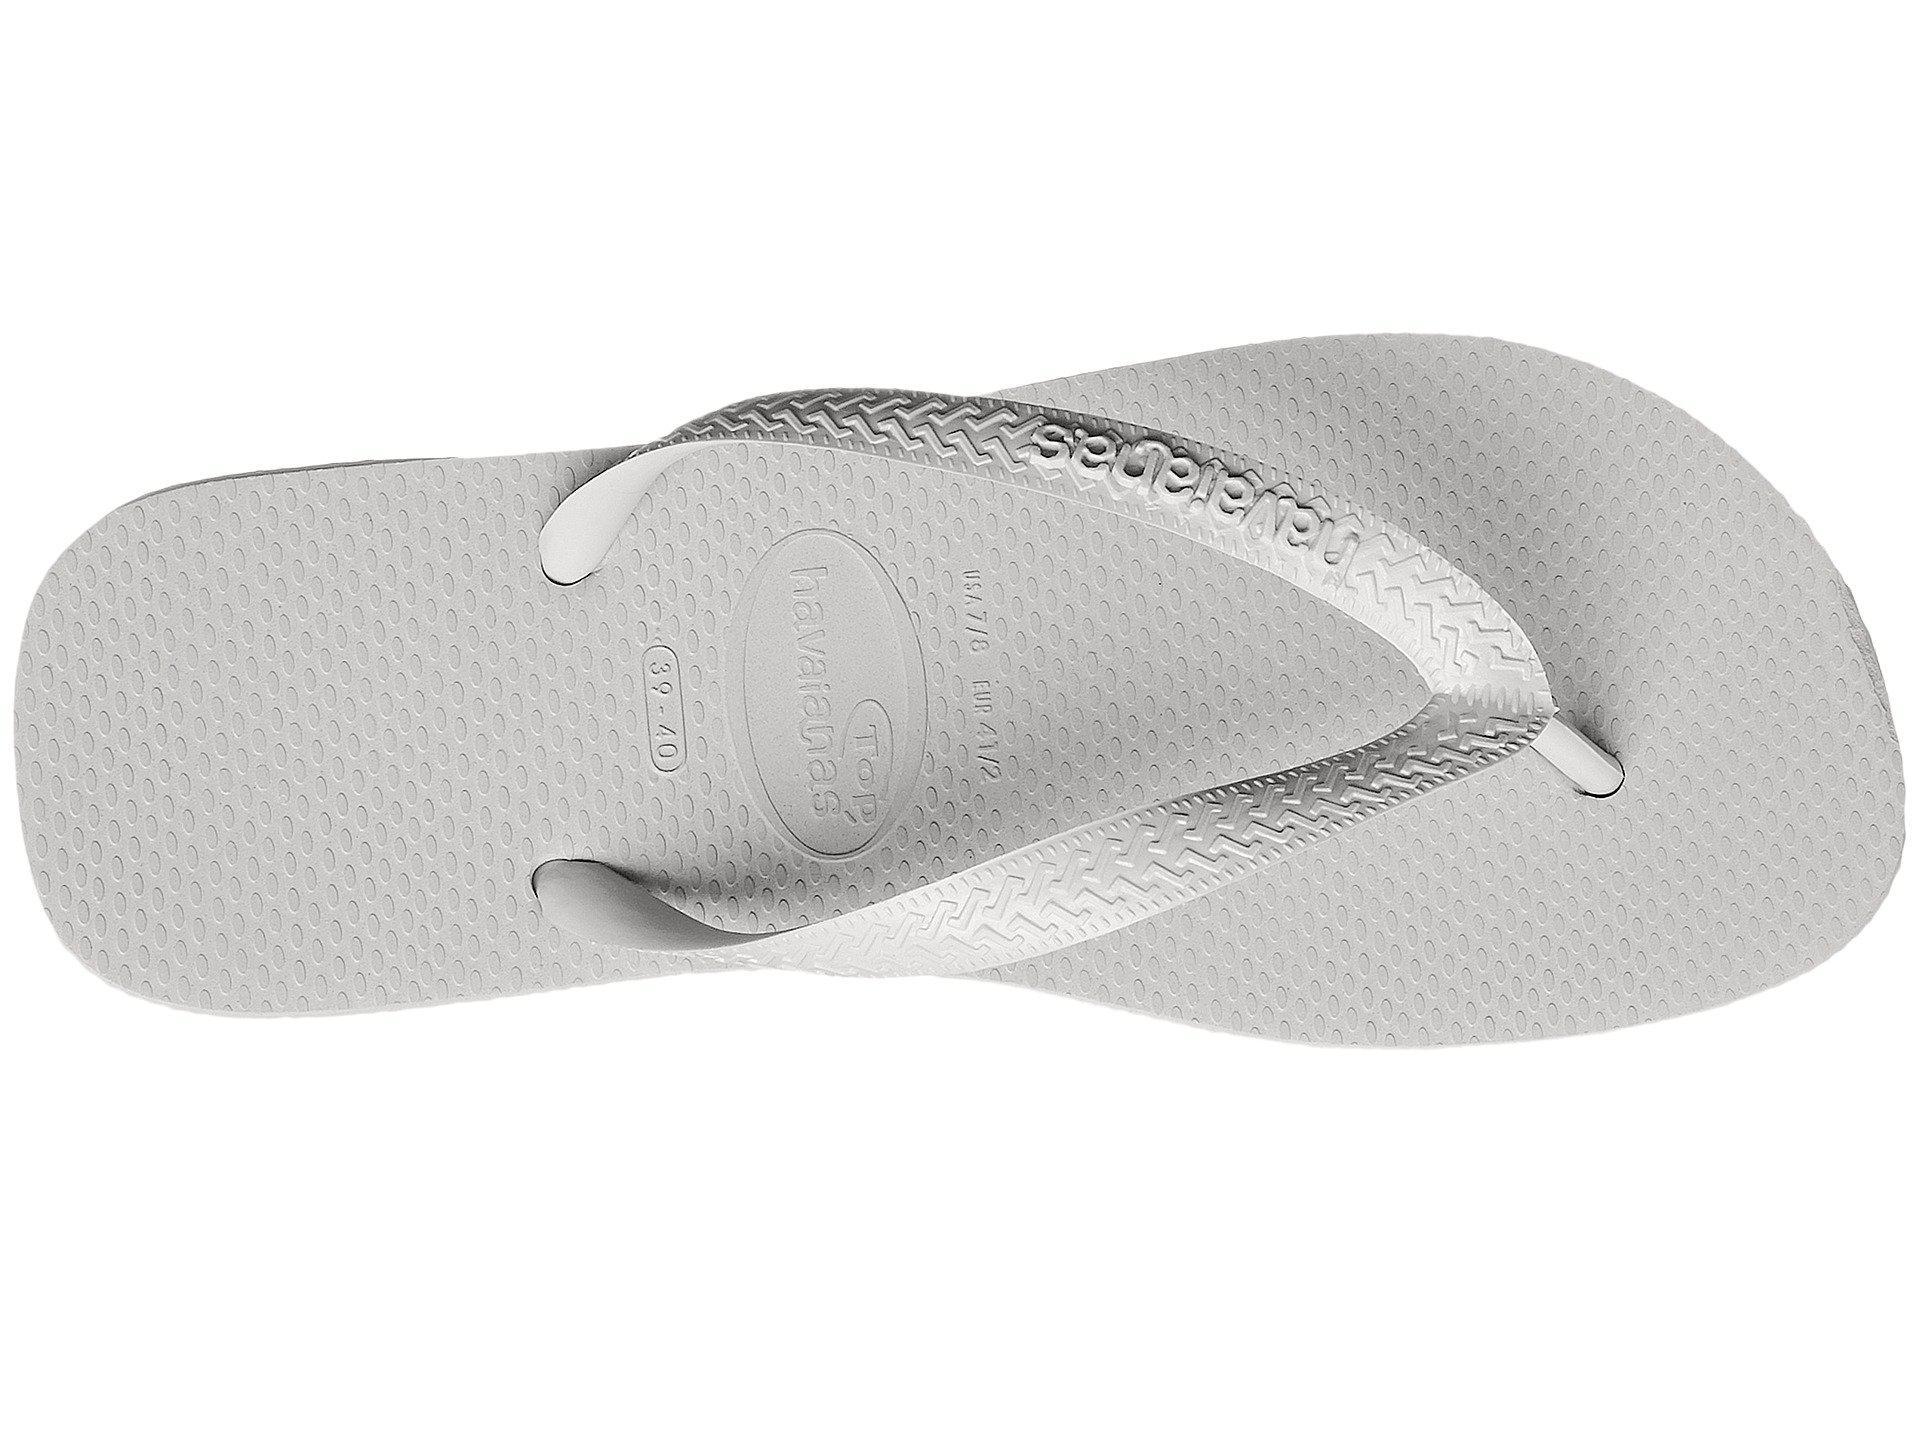 739a866d80a845 Havaianas - White Top Flip Flops (marine Blue) Men s Sandals for Men -  Lyst. View fullscreen